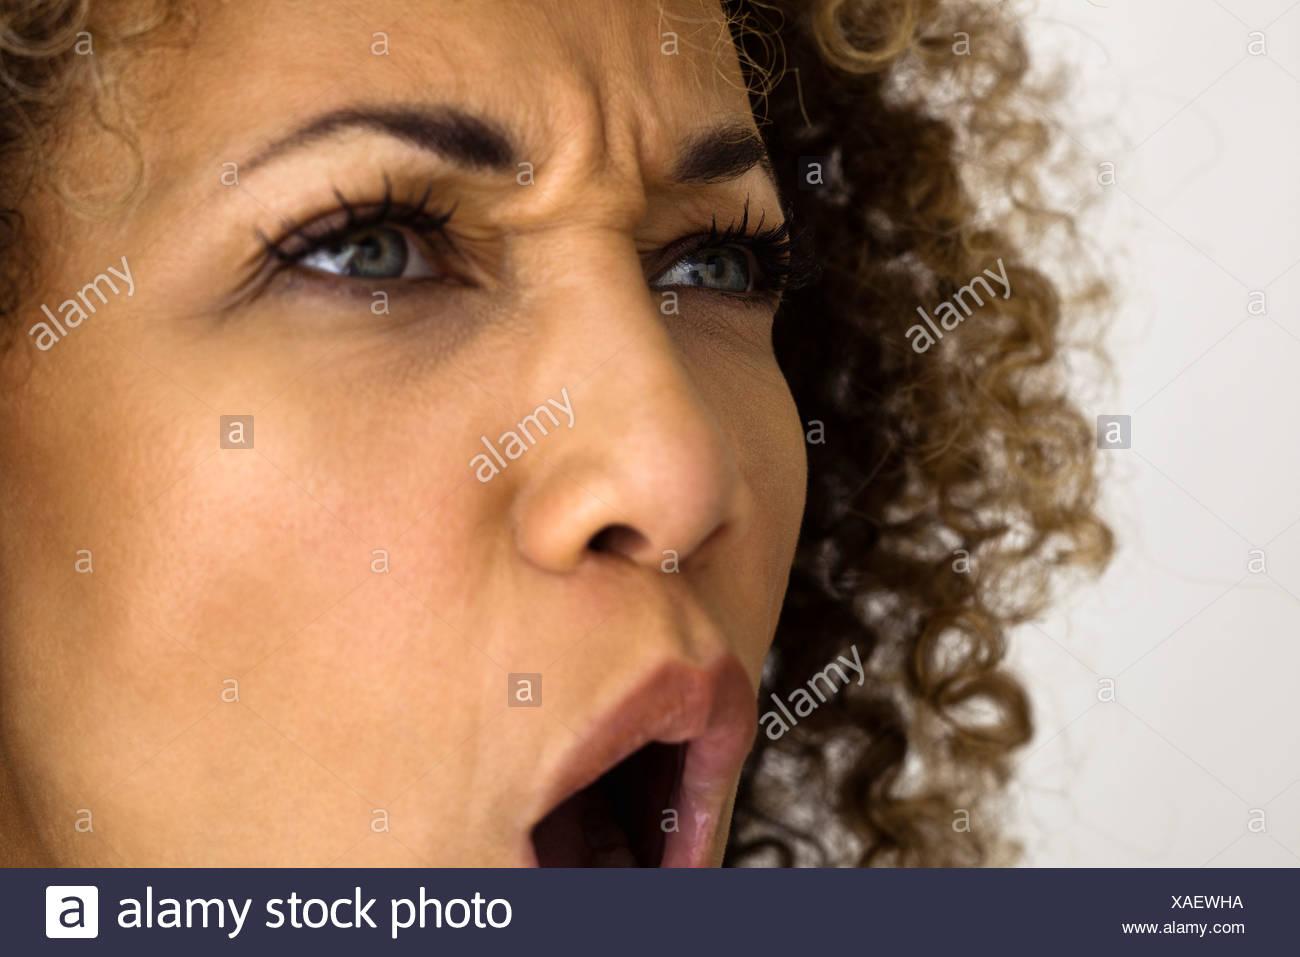 Woman furrowing brow, shouting , close-up - Stock Image